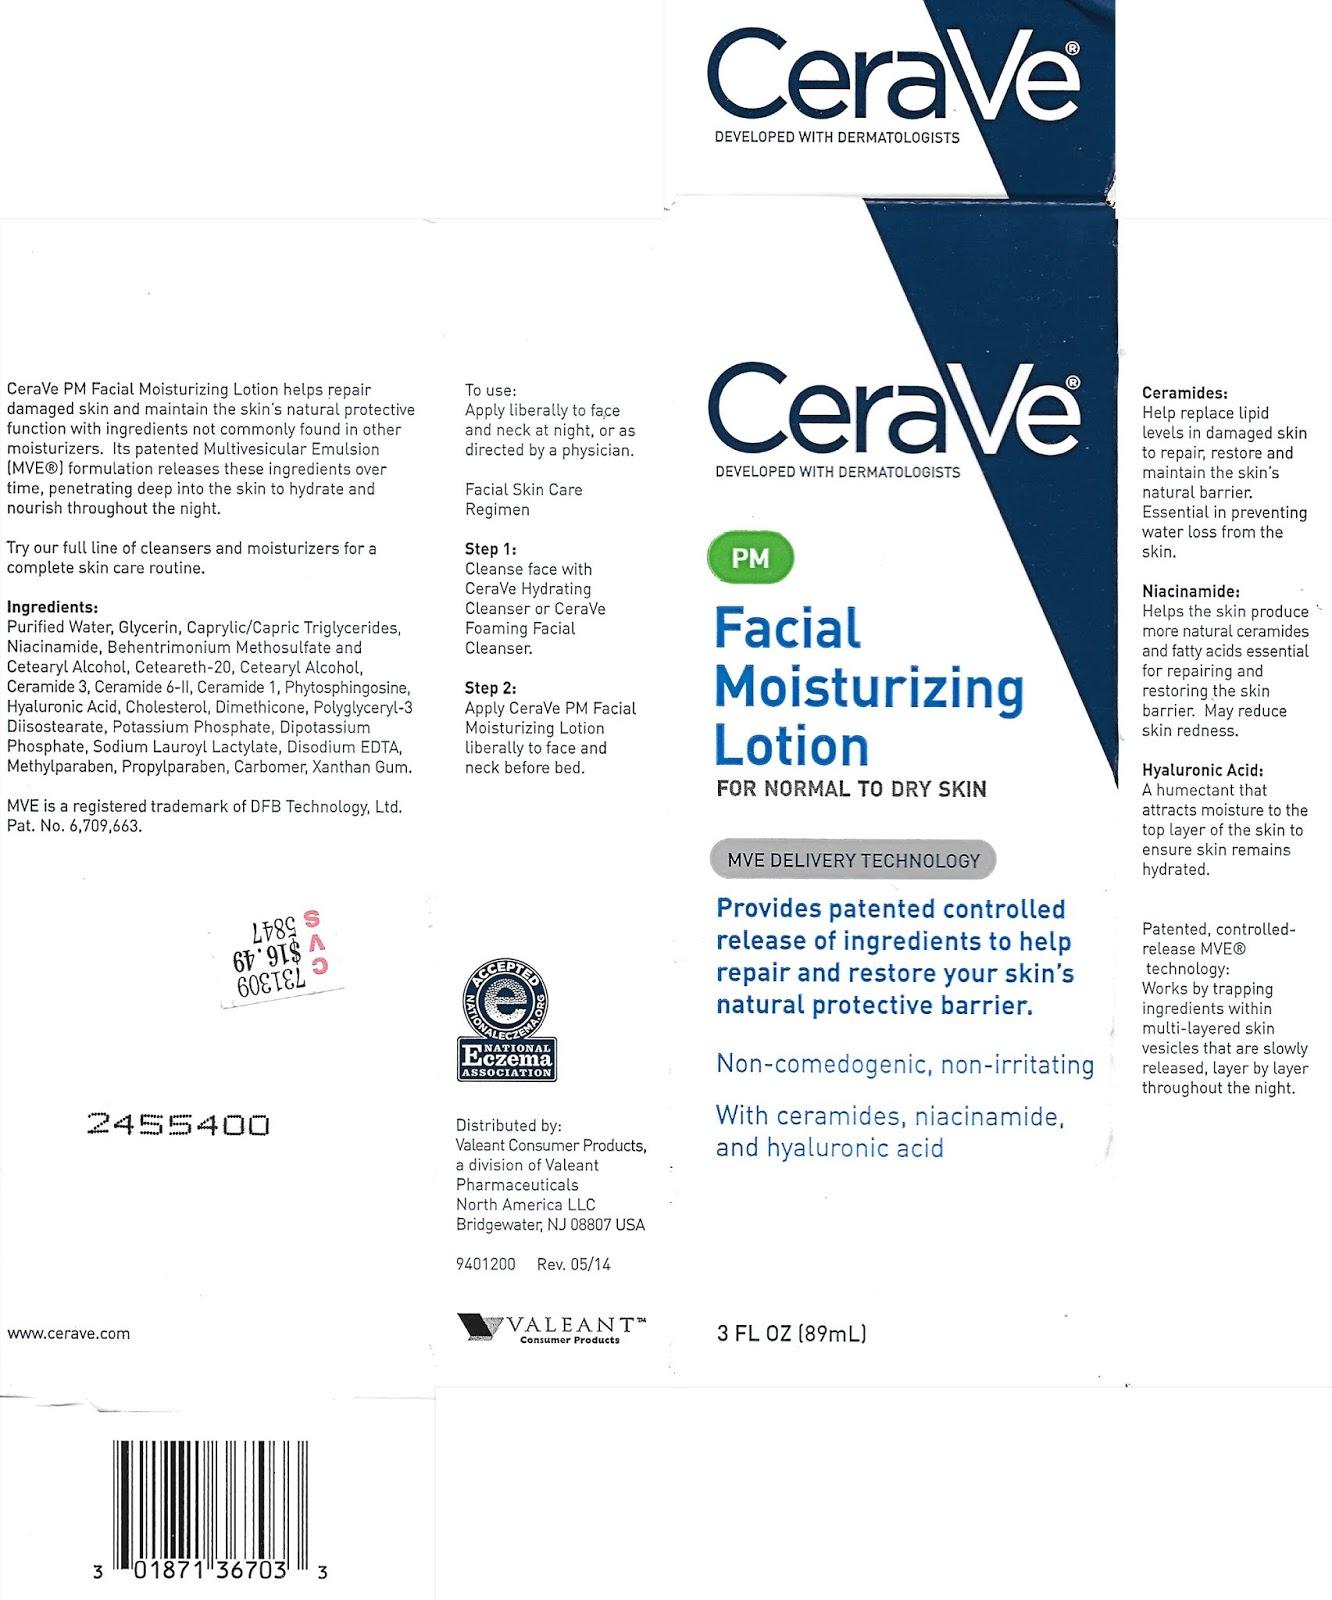 lavlilacs CeraVe PM Facial Moisturizing Lotion packaging - ingredients, descripion